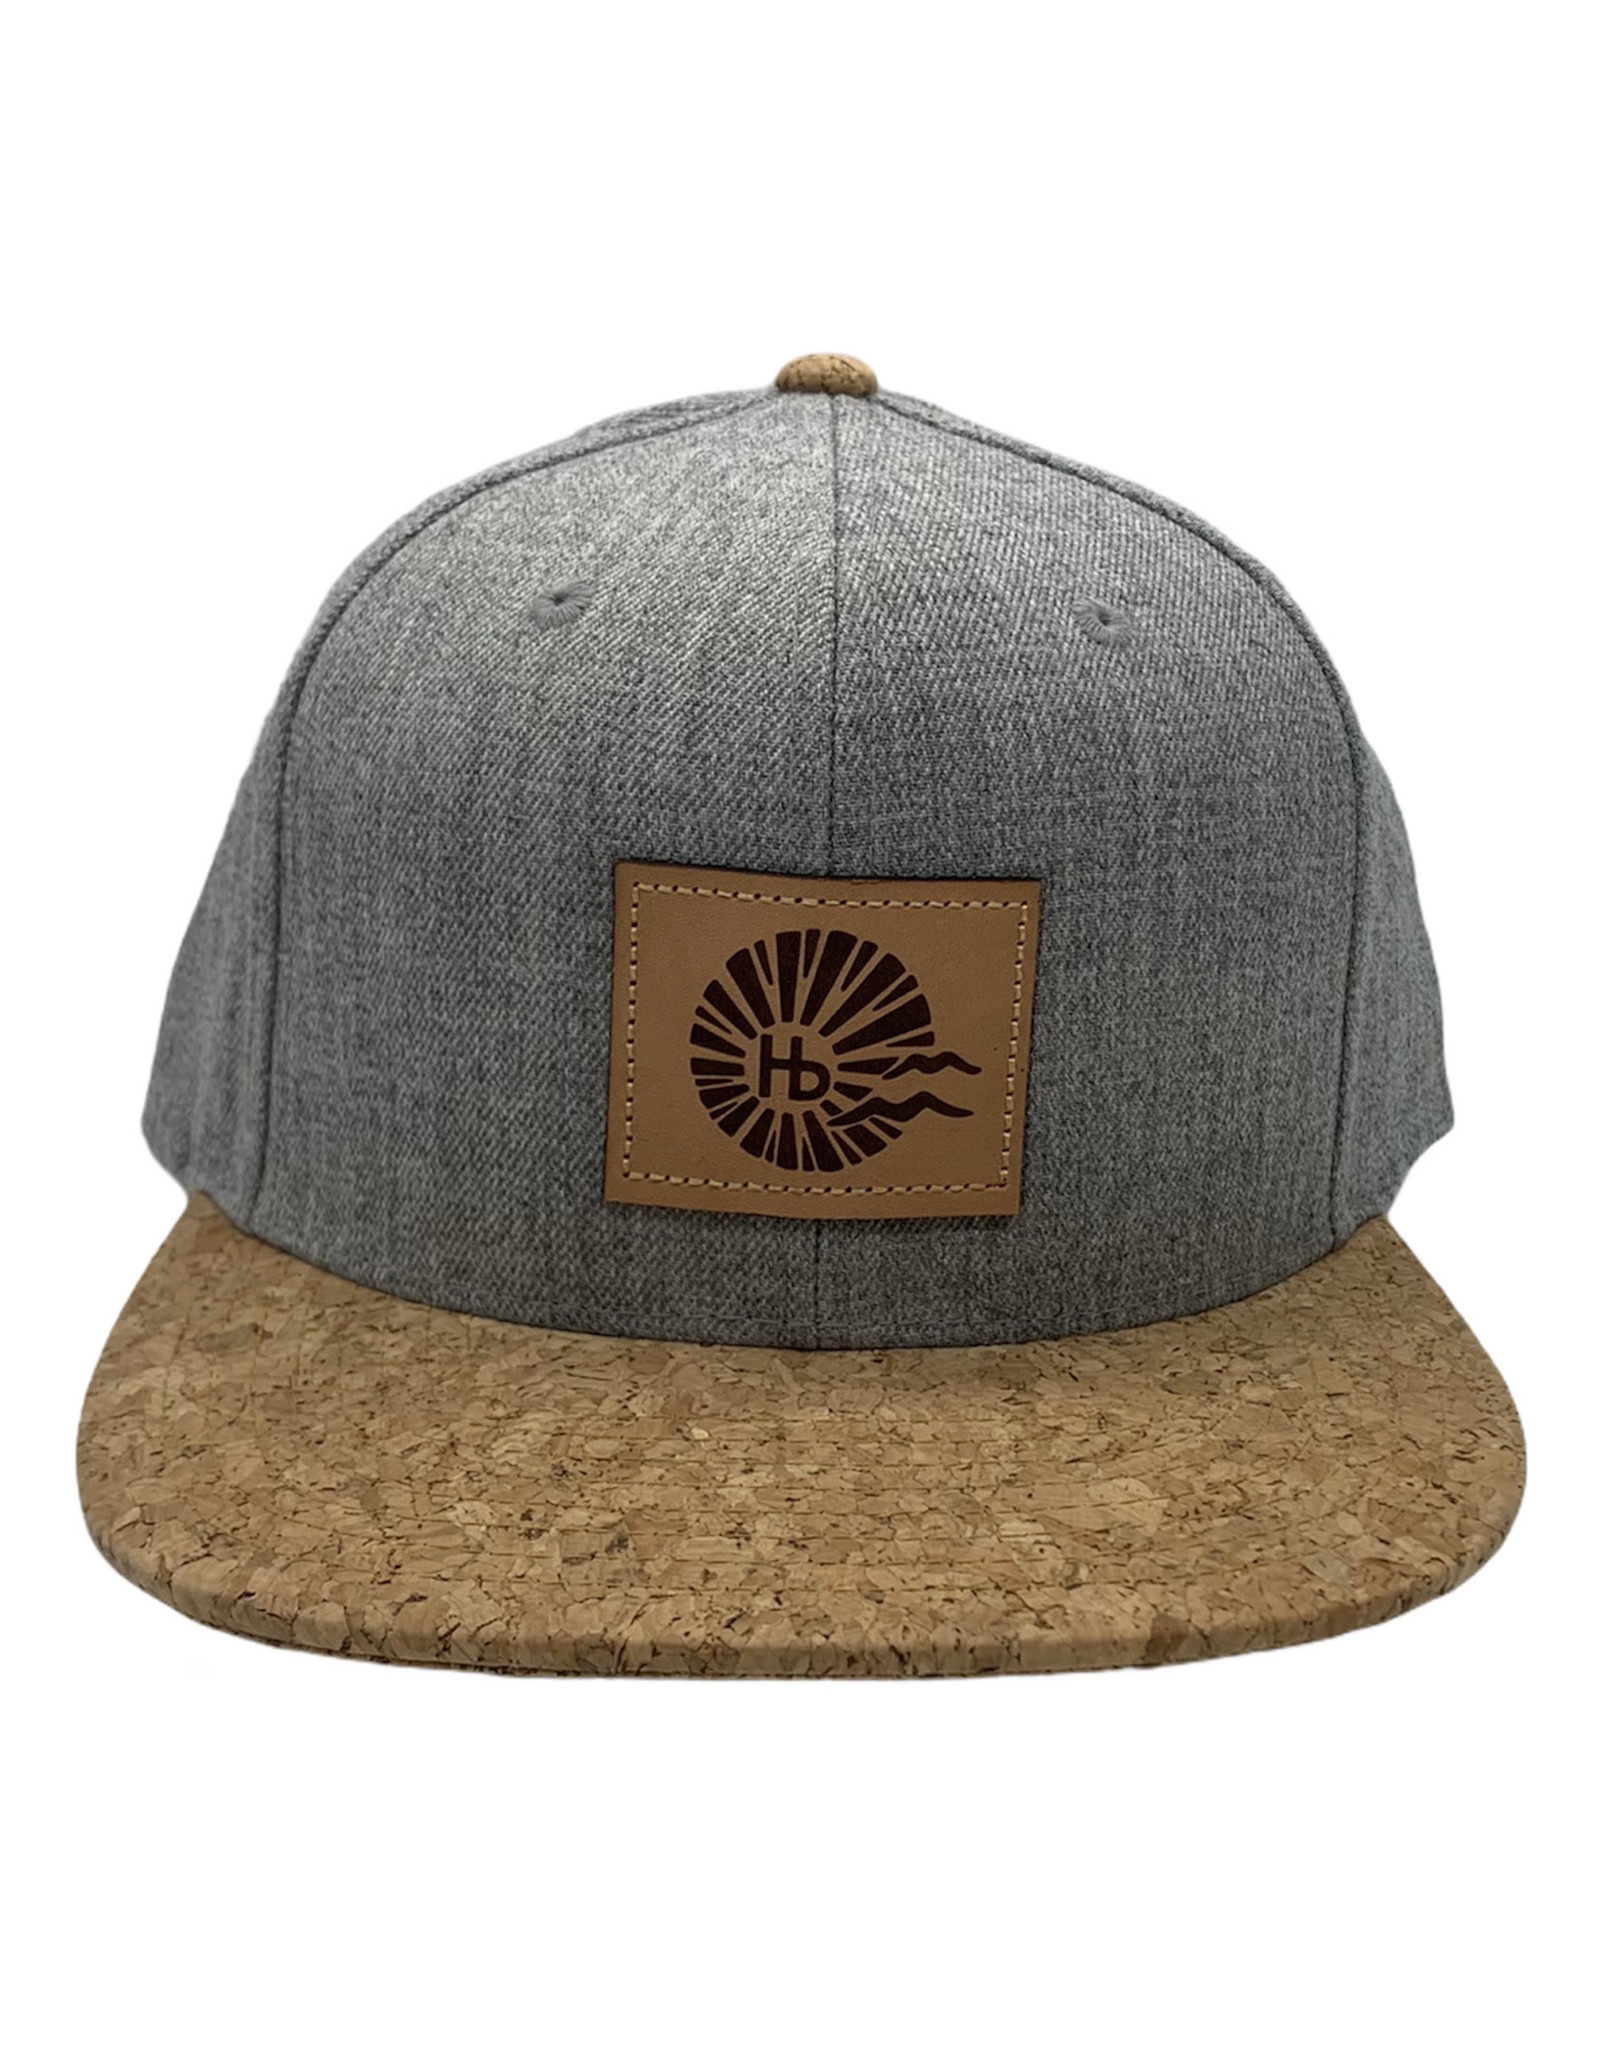 Captuer Headwear #F HB SUN HAT HEATHER GREY CORK